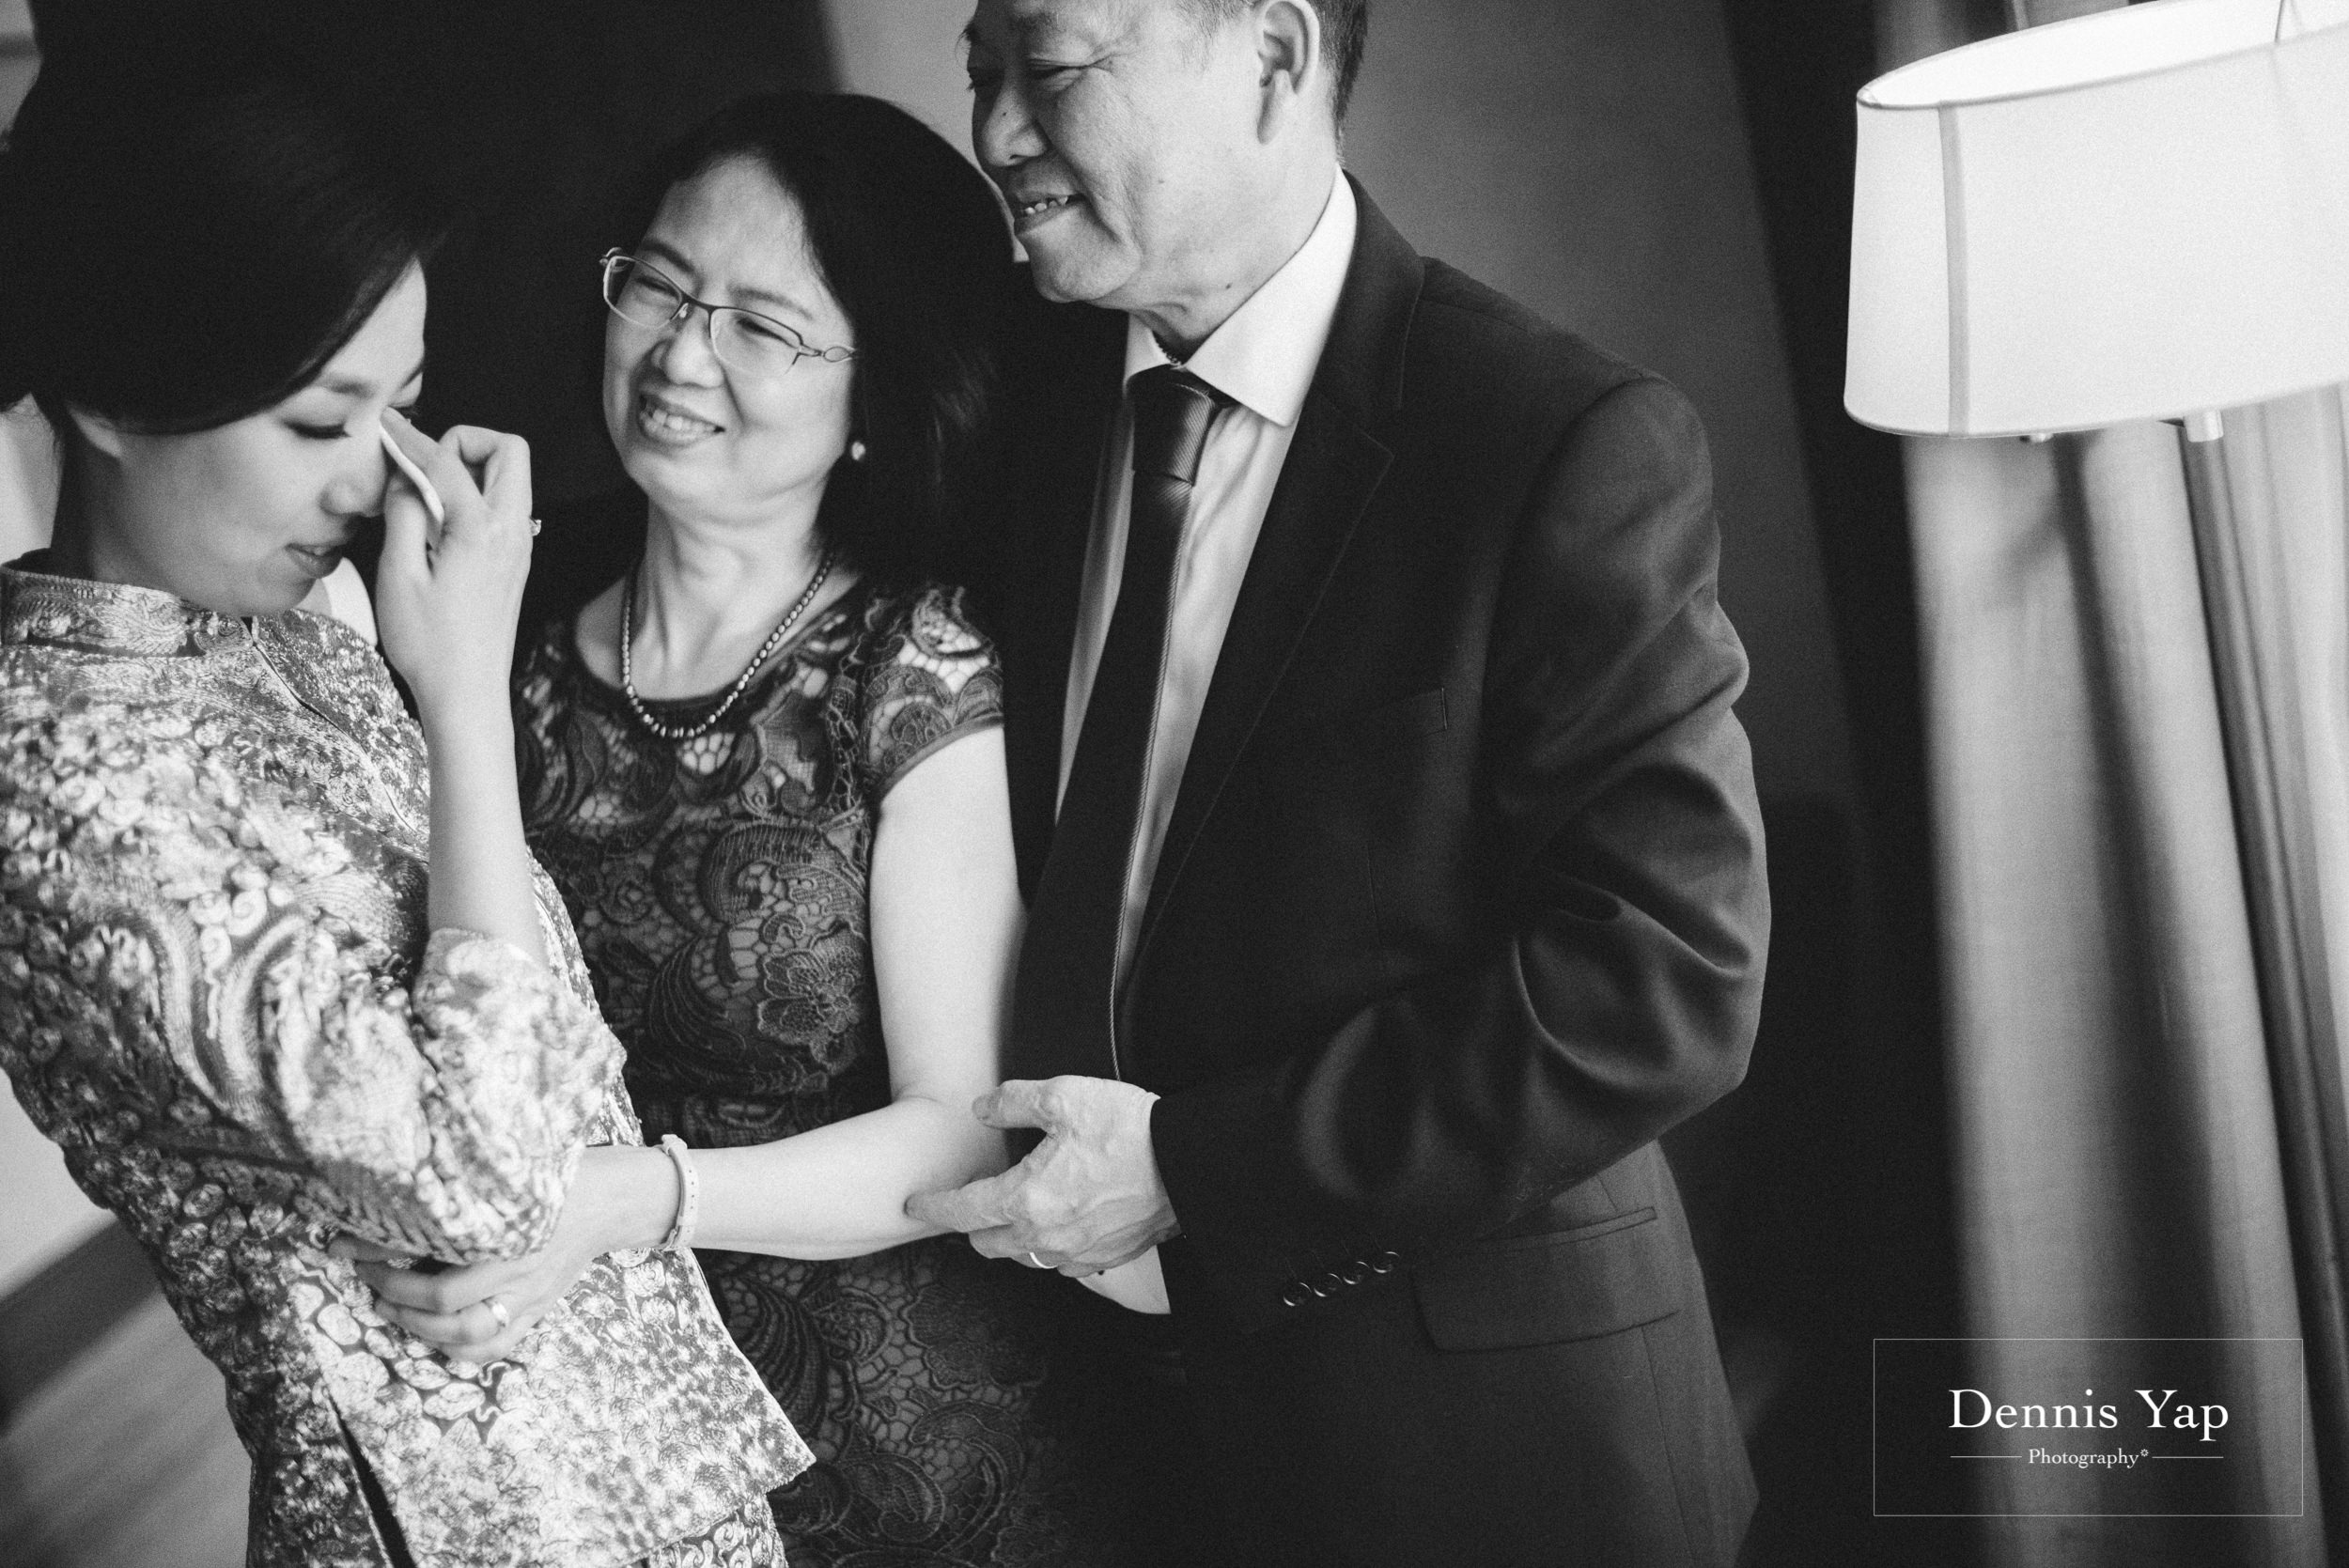 wai keong jenny wedding day bangsar dennis yap photography emotions beloved family-6.jpg